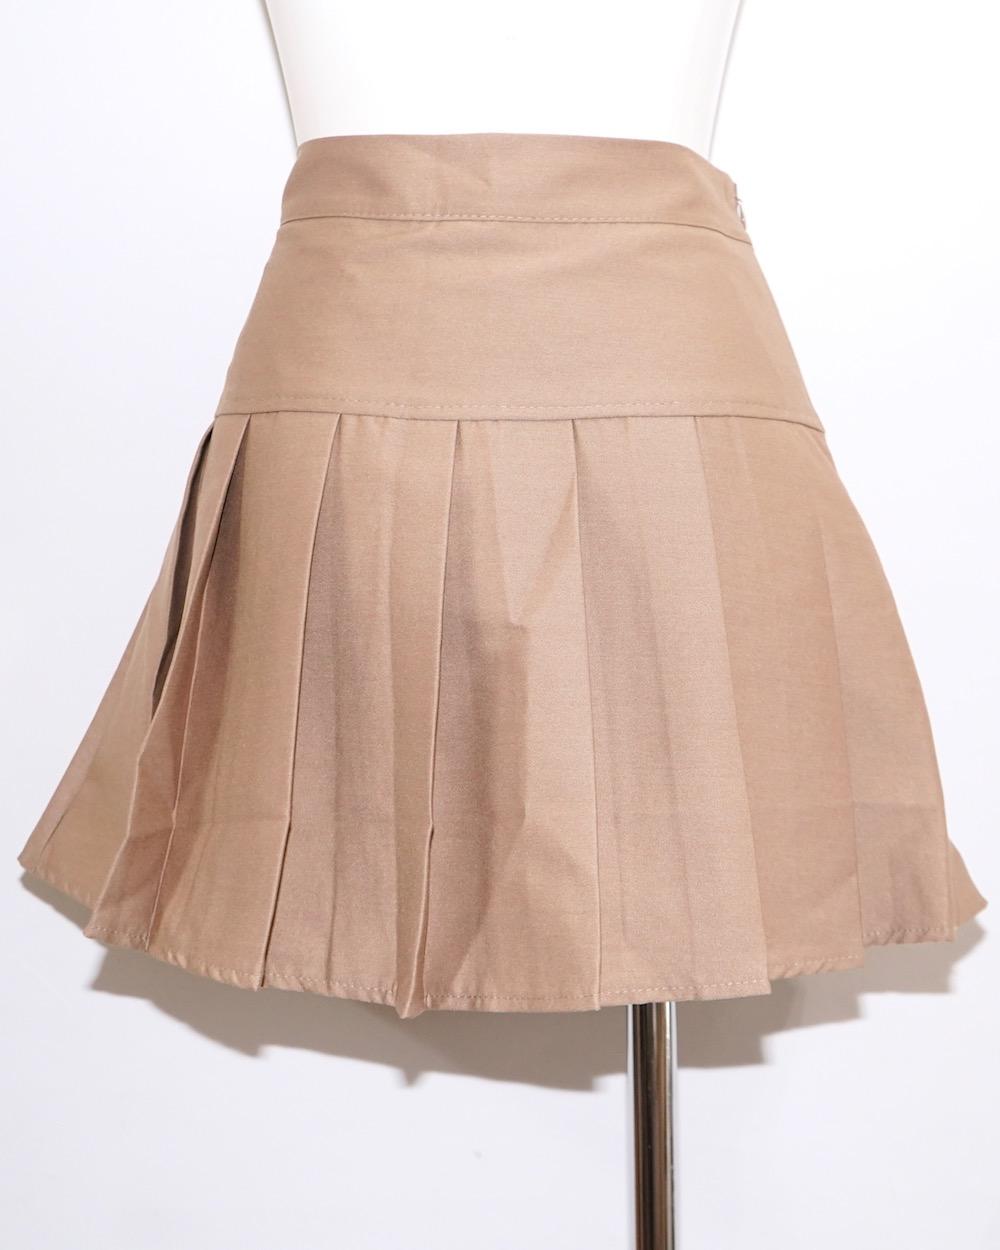 Basic Pleats Mini Skirt (beige)